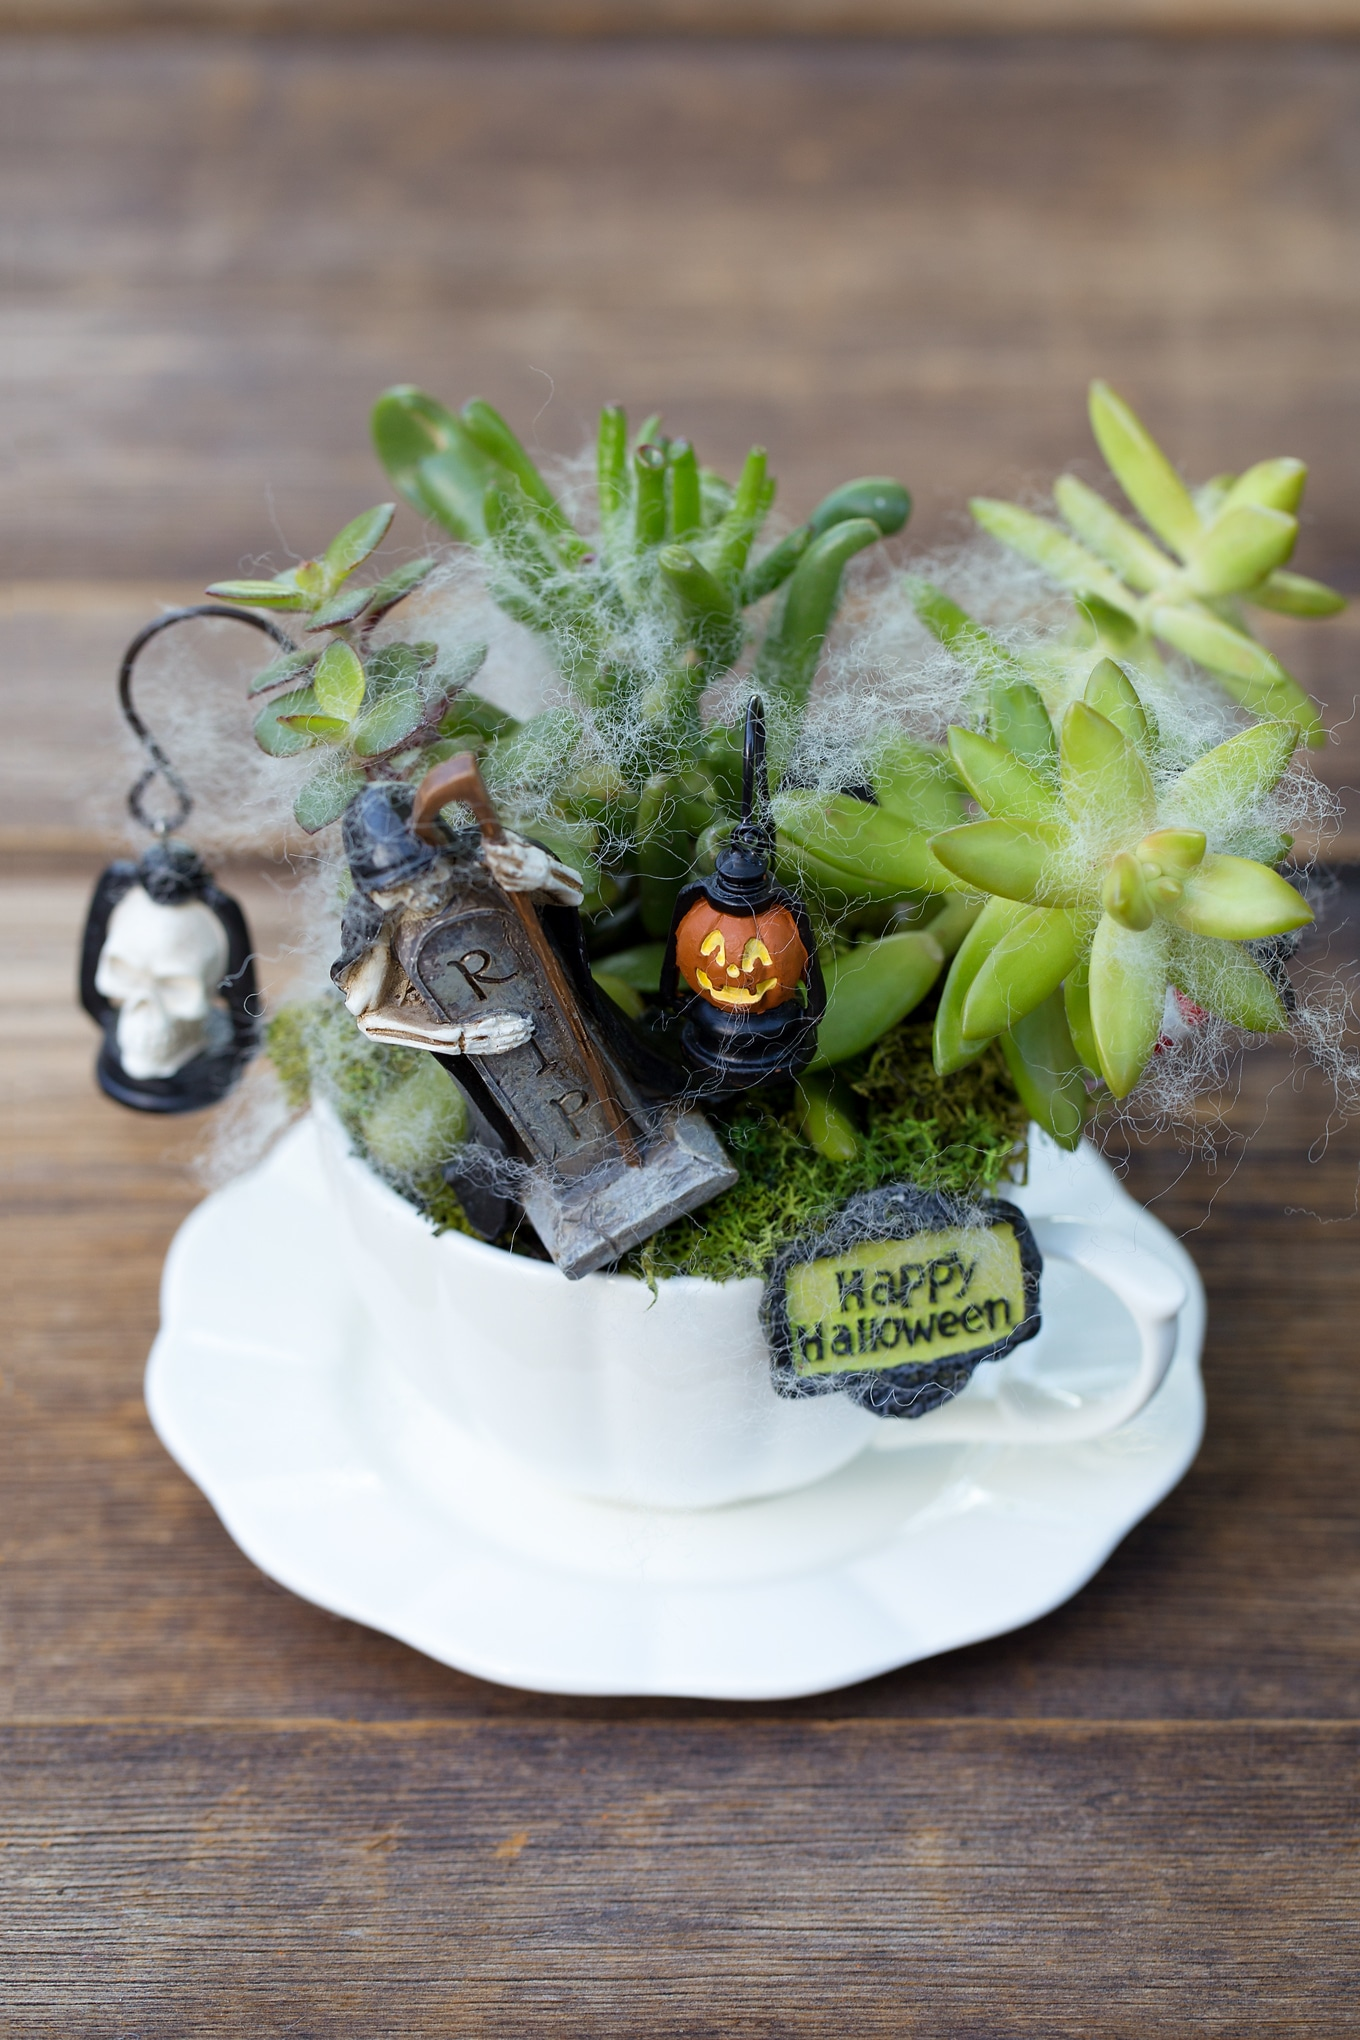 How to Make a Halloween Teacup Garden Craft